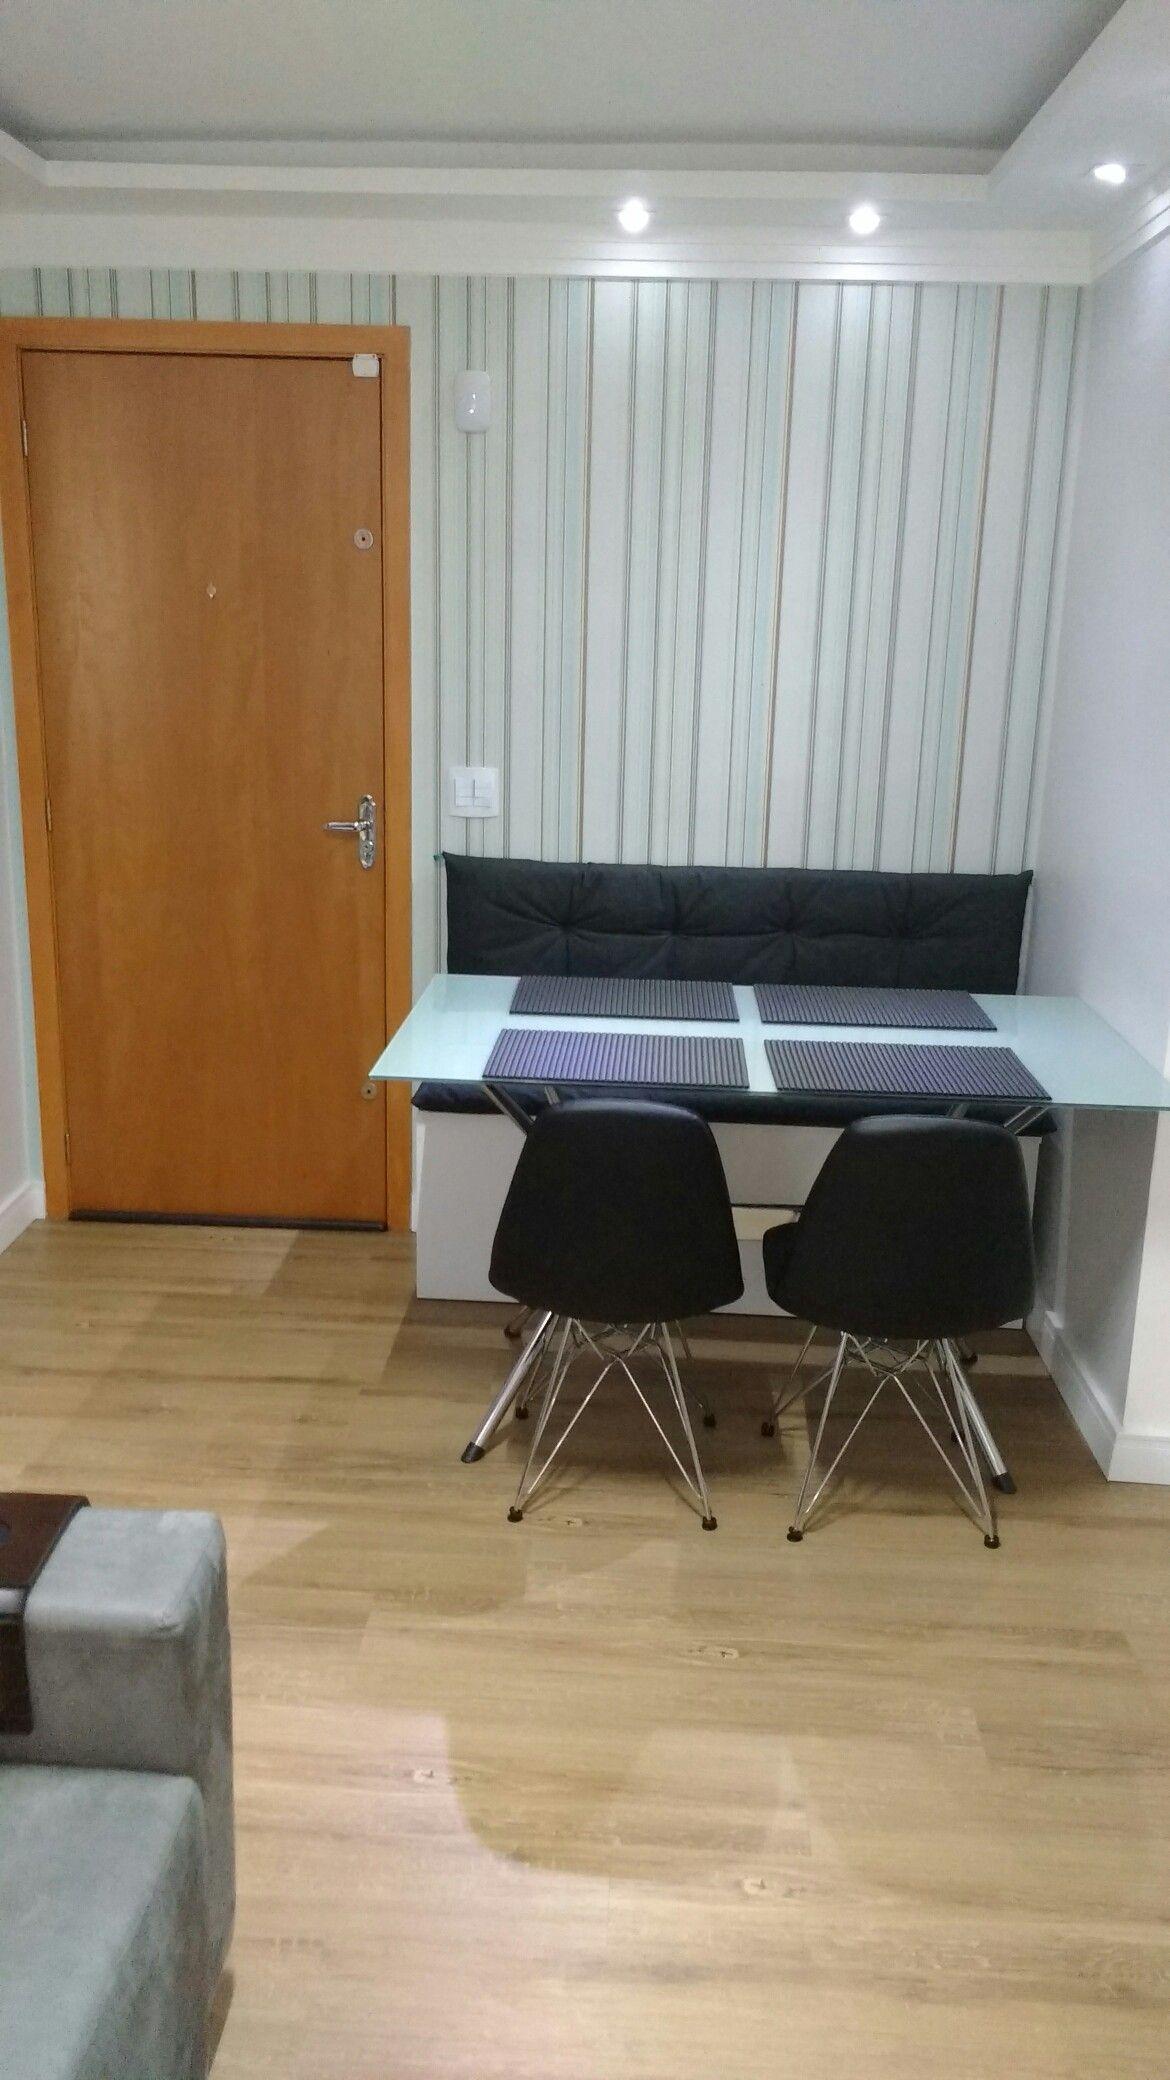 Sala De Jantar Canto Alem O Papel De Parede Mesa De Vidro Sanca  -> Papel De Parede Para Sala Londrina